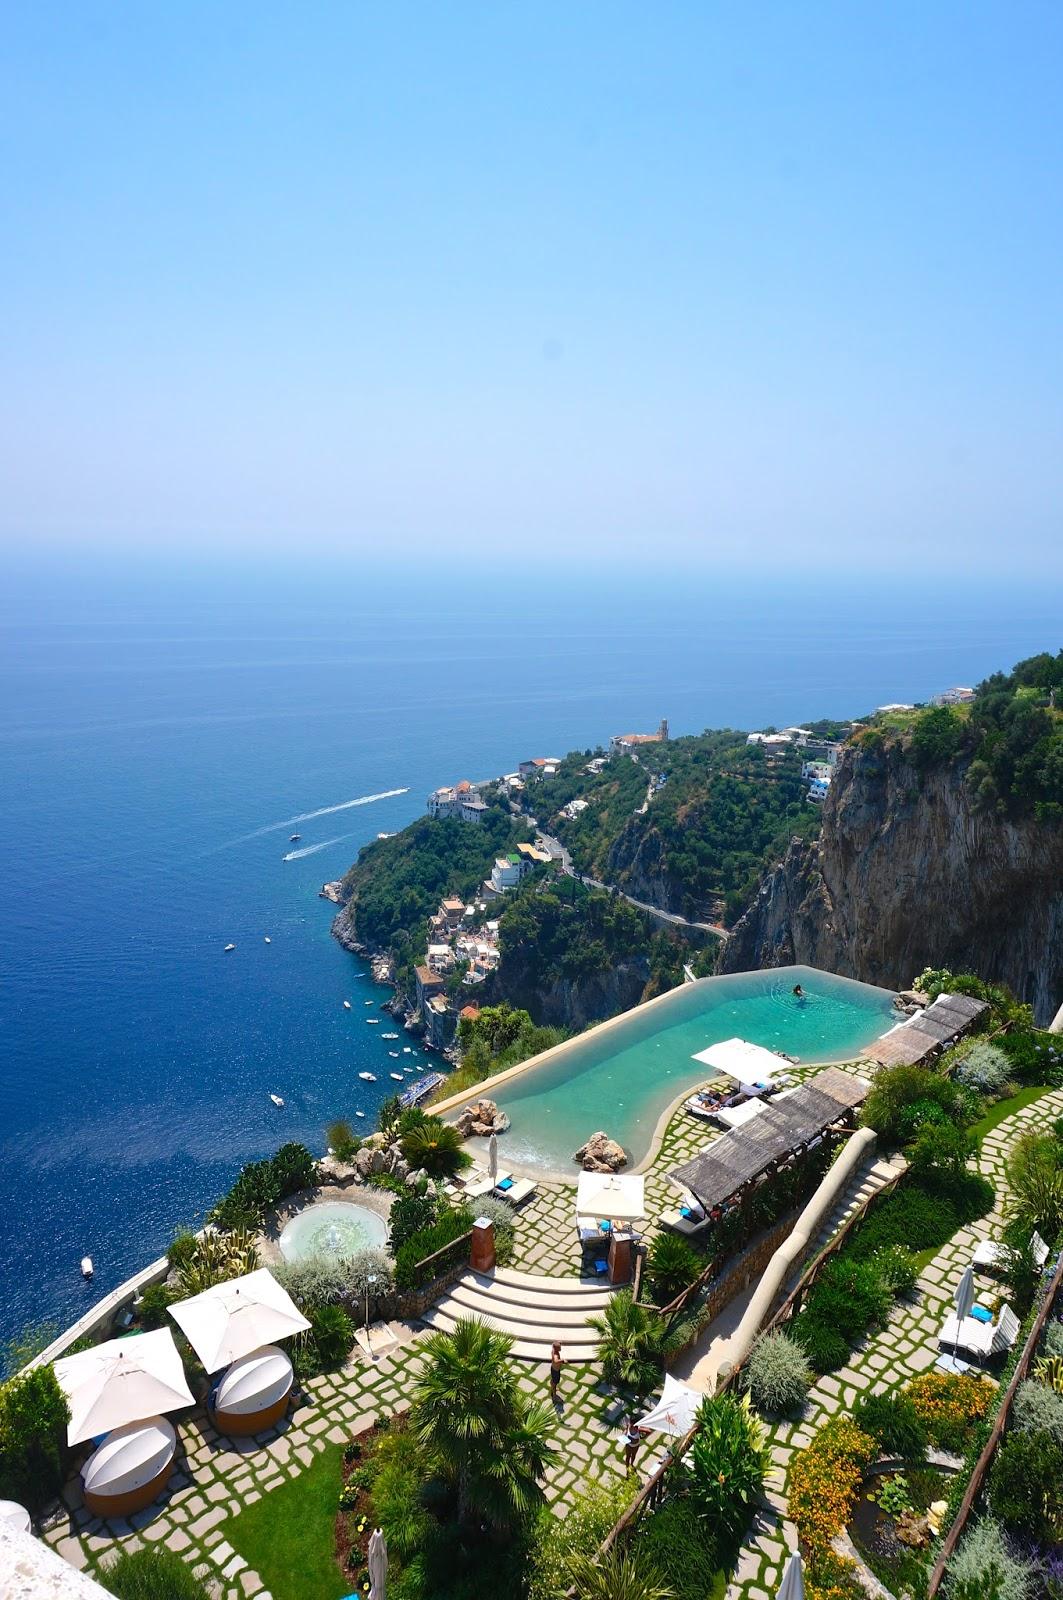 Our Honeymoon: Monastero Santa Rosa, Amalfi Coast